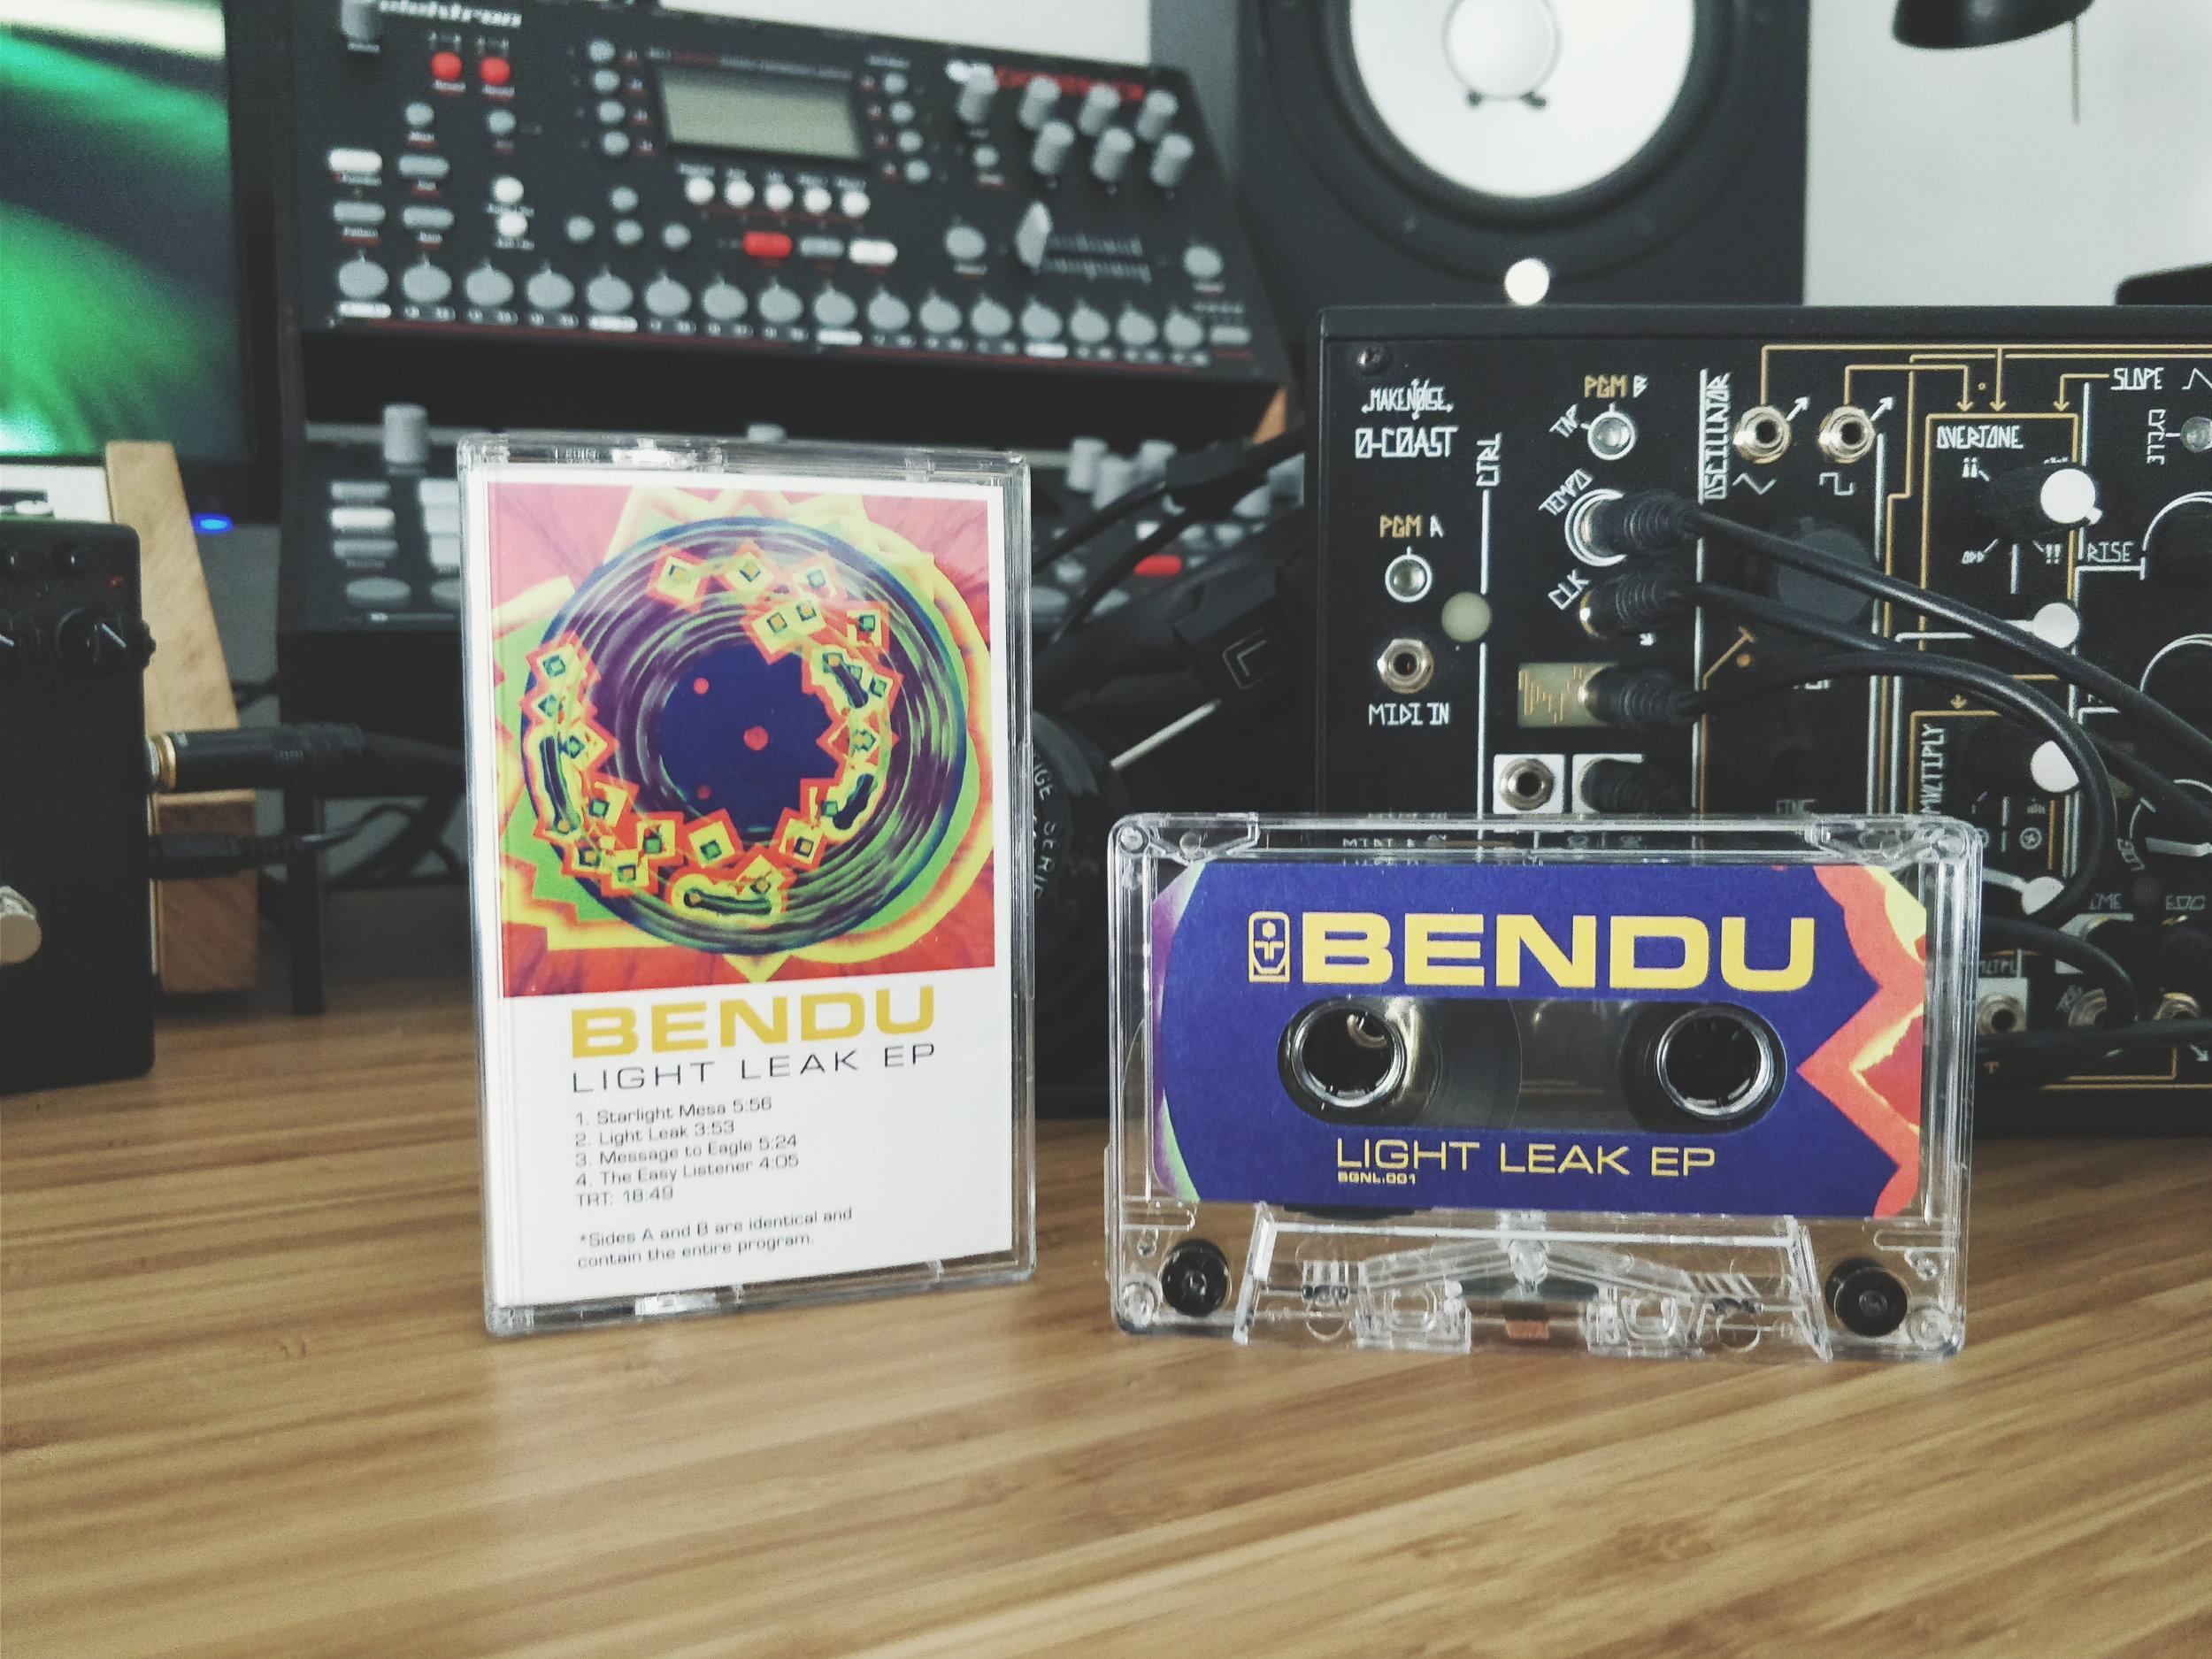 Bendu - Light Leak EP